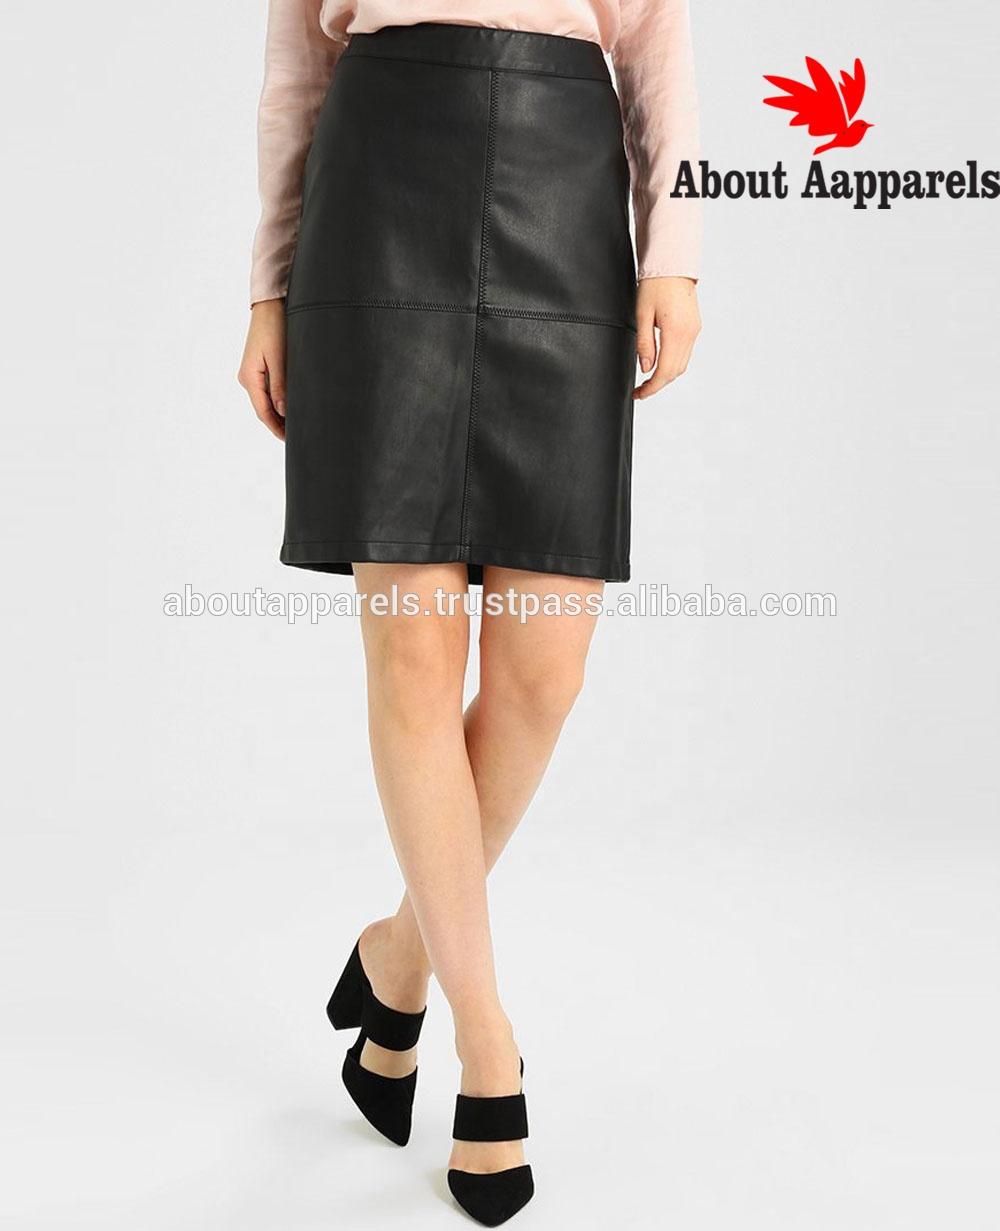 2a28529cccd46 Moderner Damen-Leder-Minirock mit Knopf-Design, heißer verkaufender  Frauen-kundenspezifischer lederner Bleistiftrock,